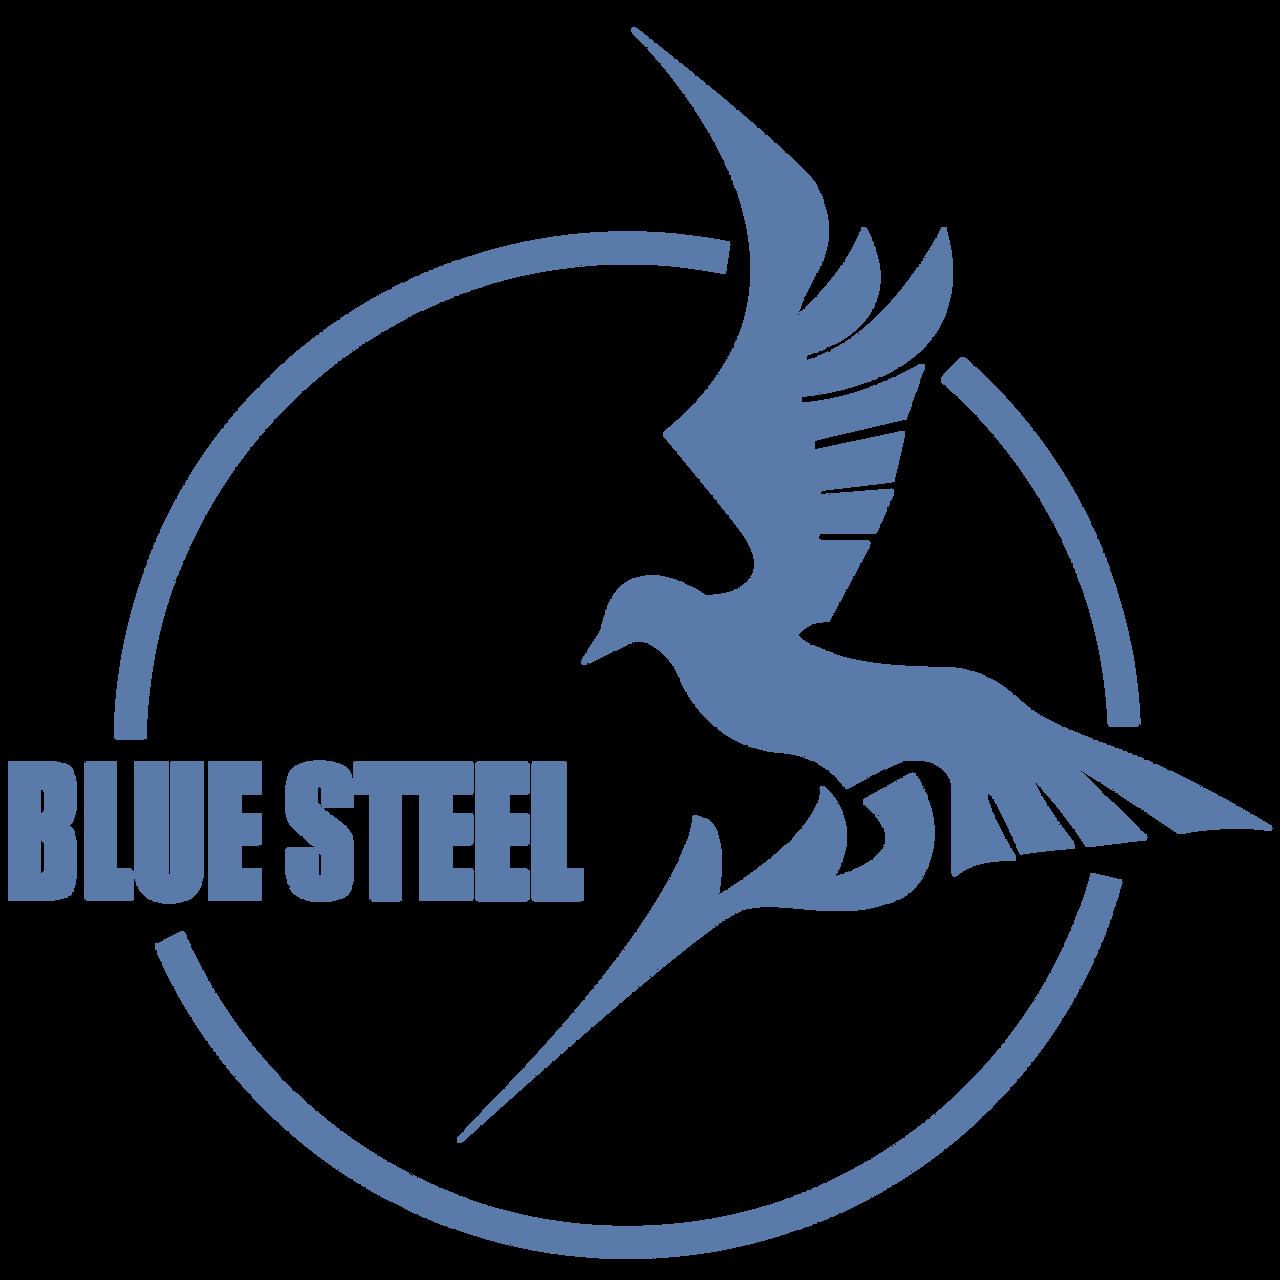 Arpeggio of Blue Steel logo vector by tobuei on DeviantArt